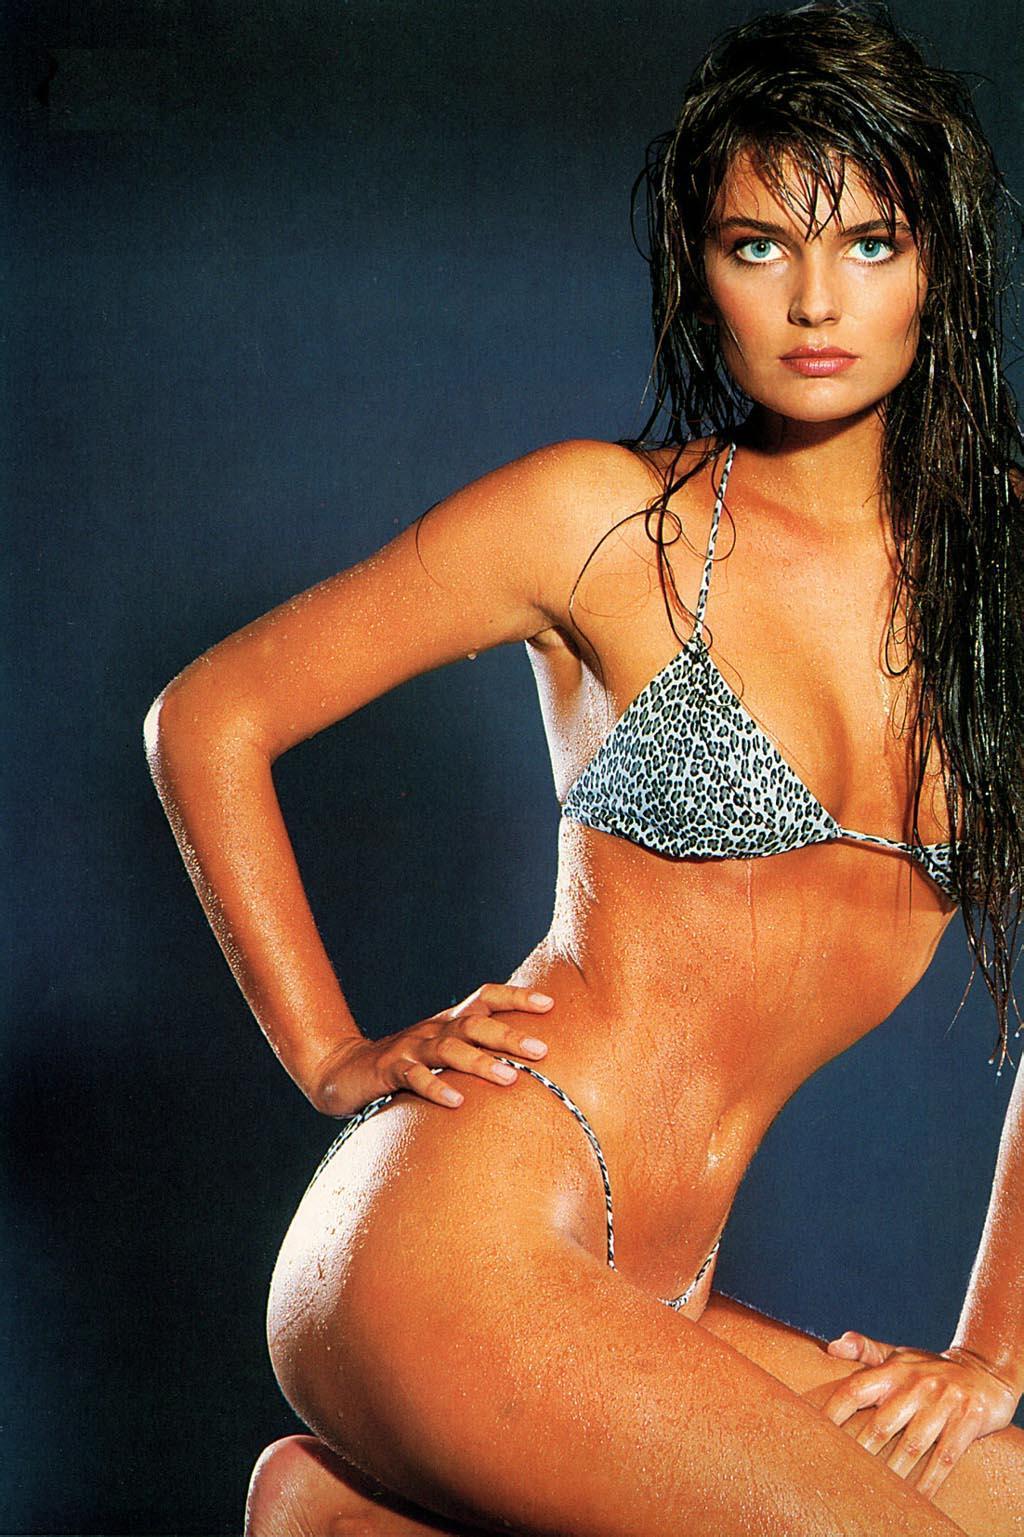 Micro bikinis suits women